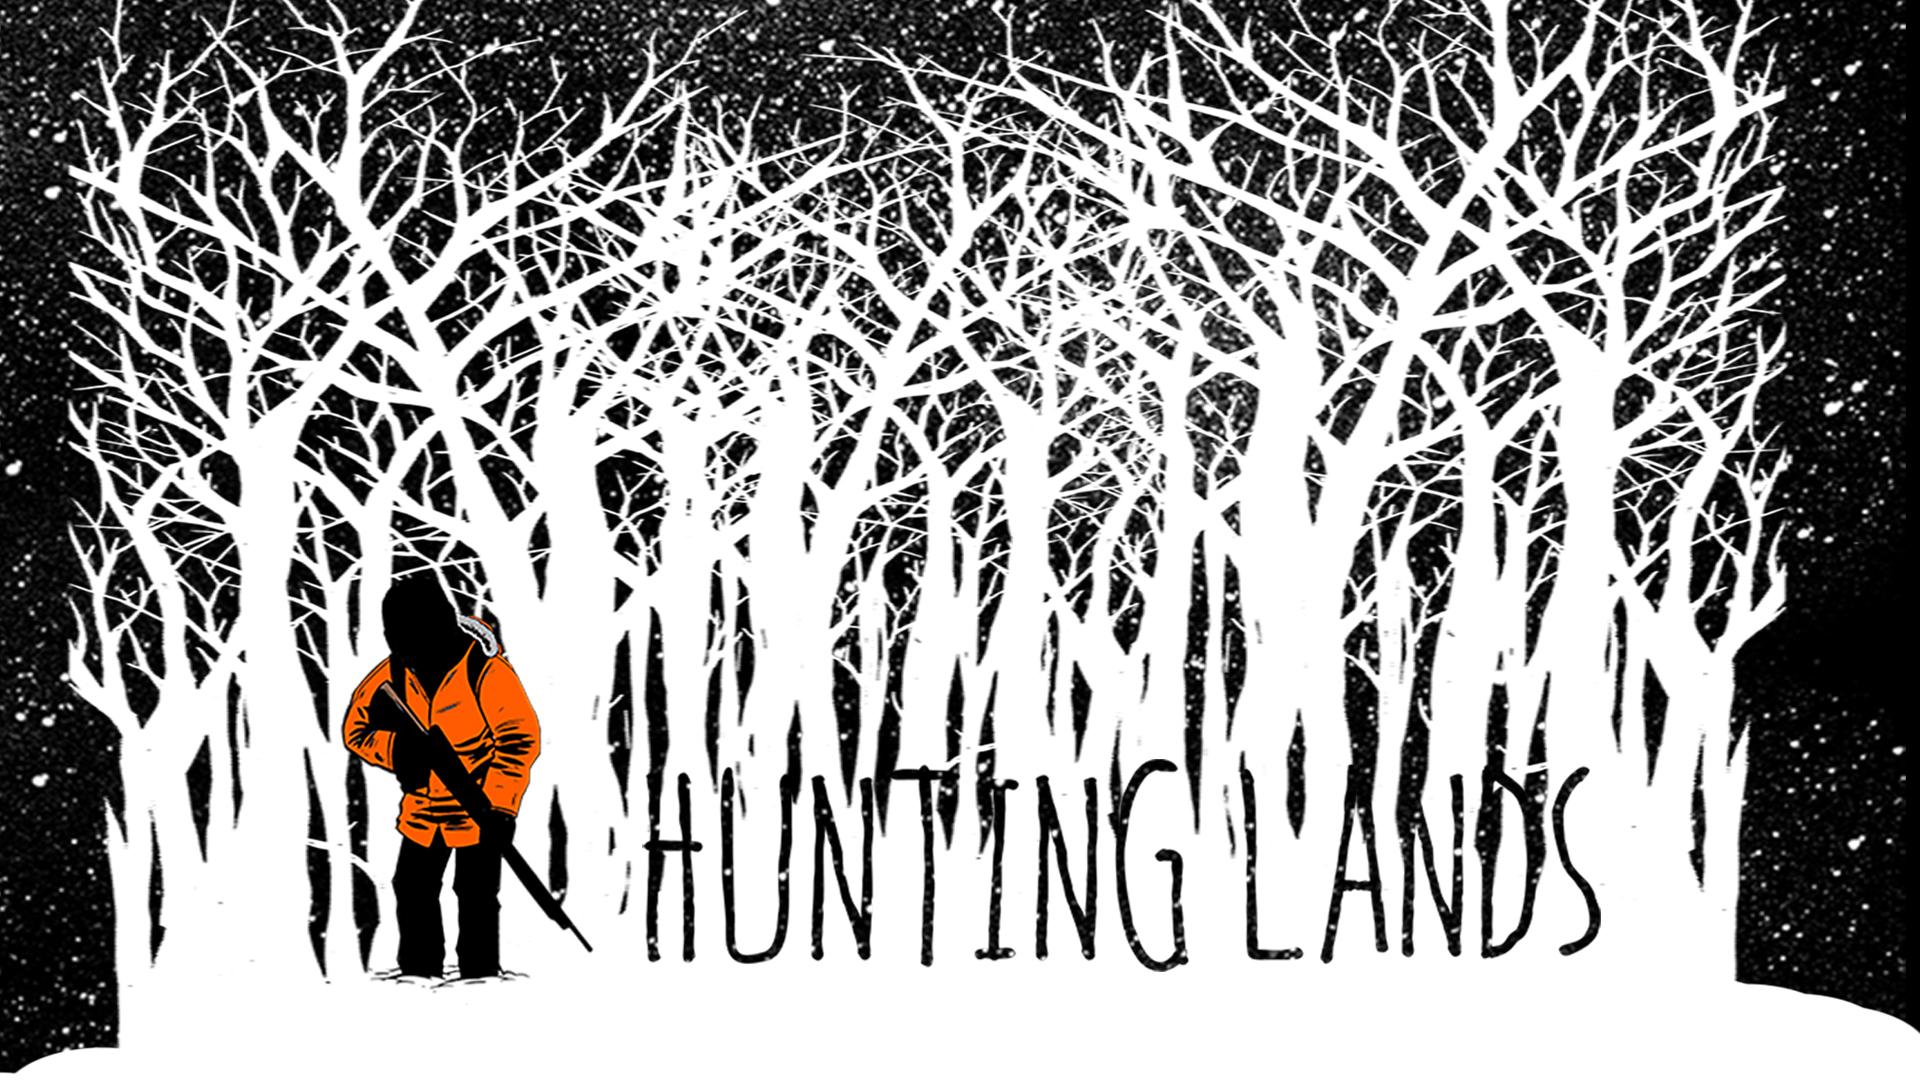 Hunting Lands